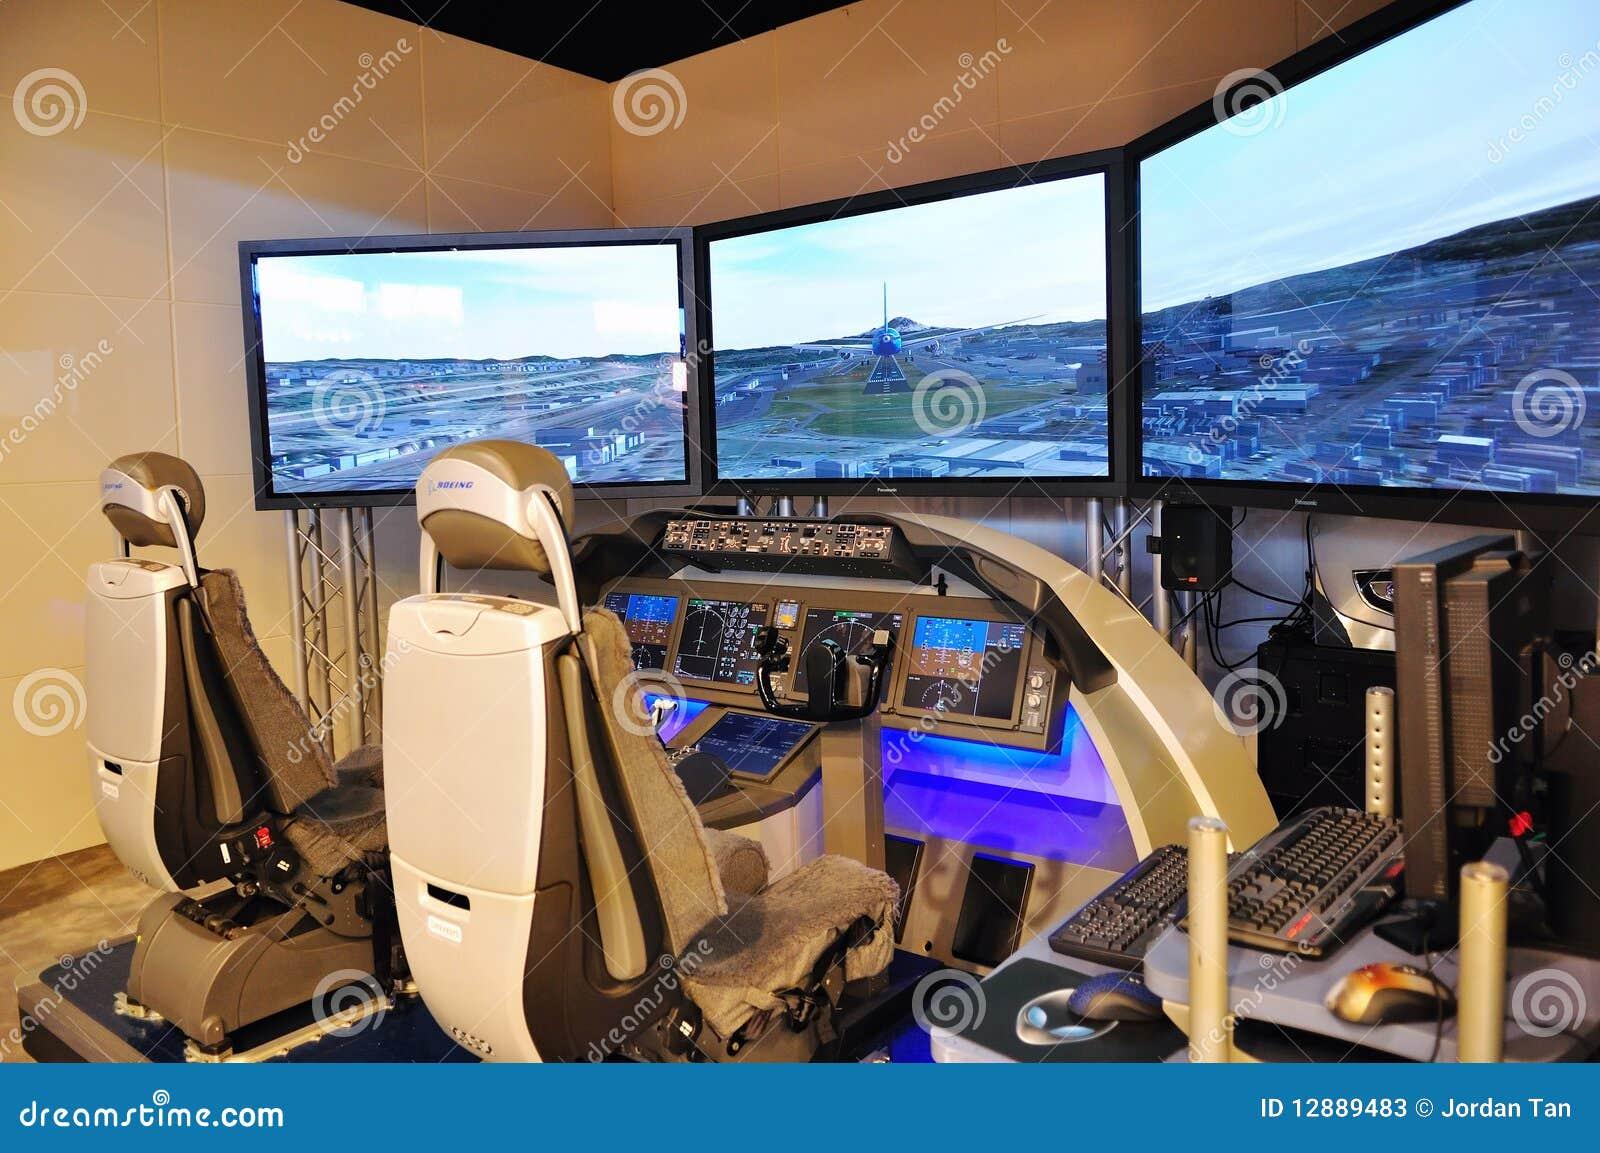 Boeing flight simulator at Singapore Airshow